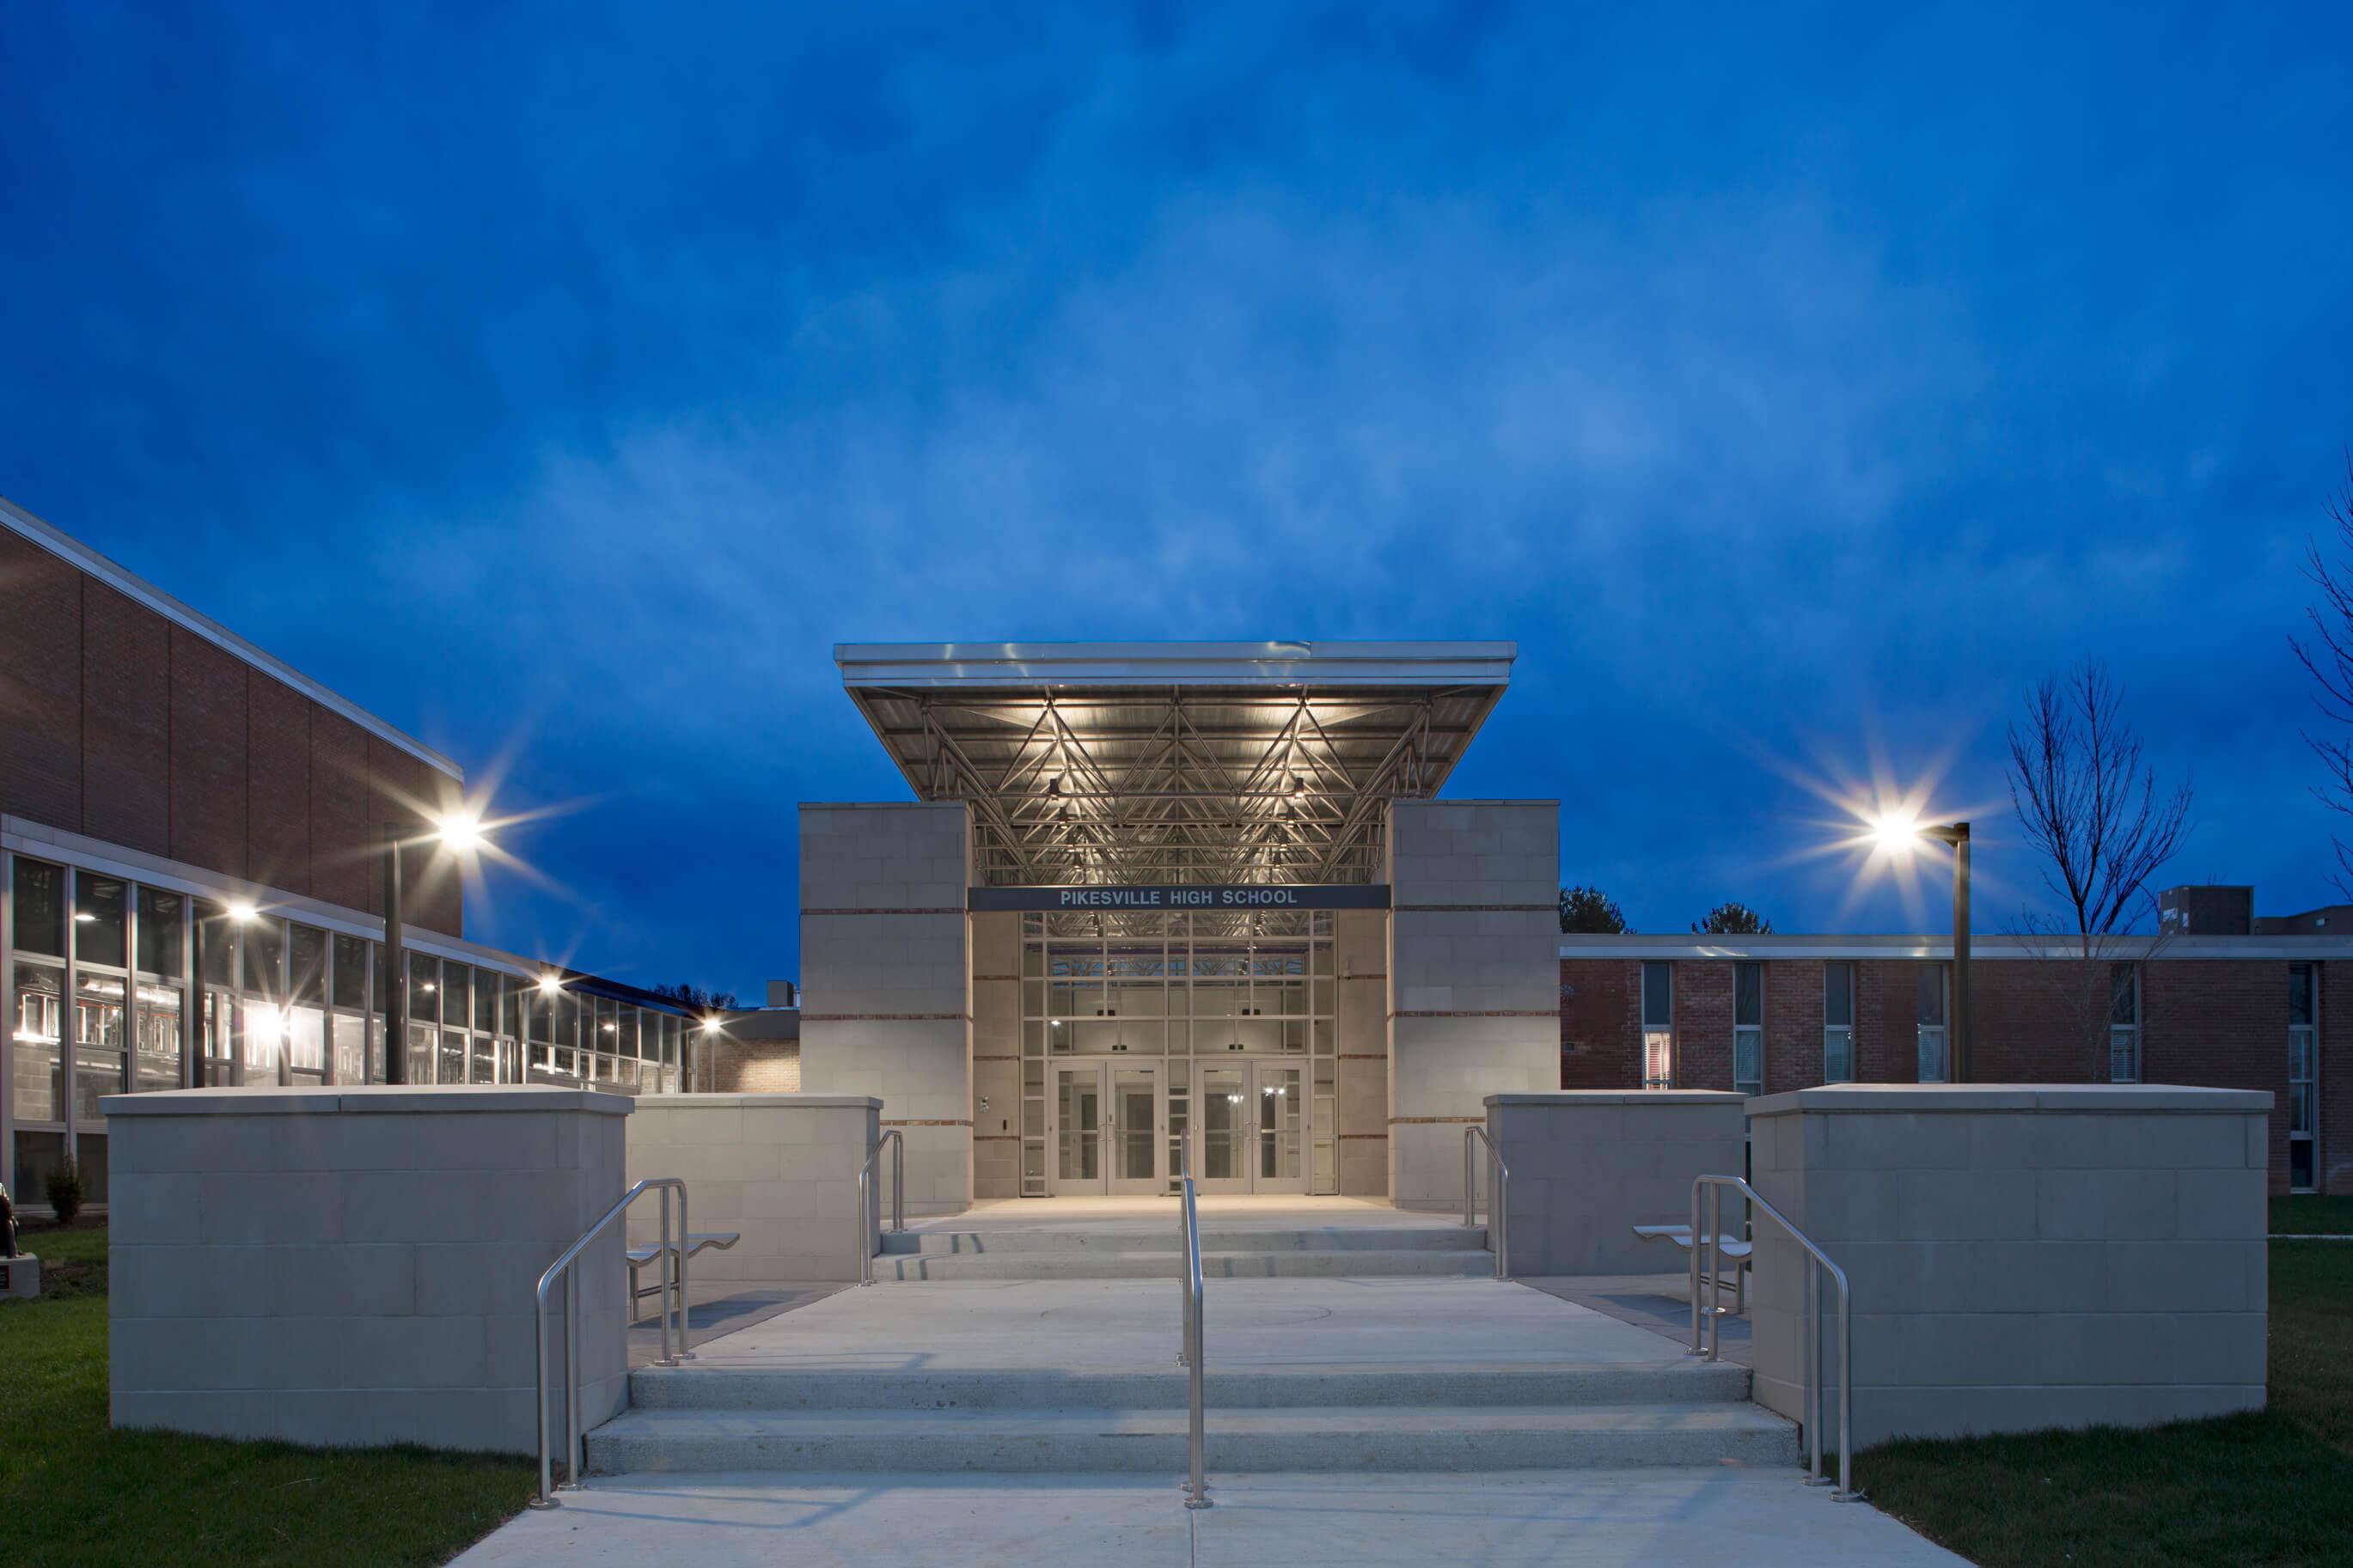 Pikesville High School image1